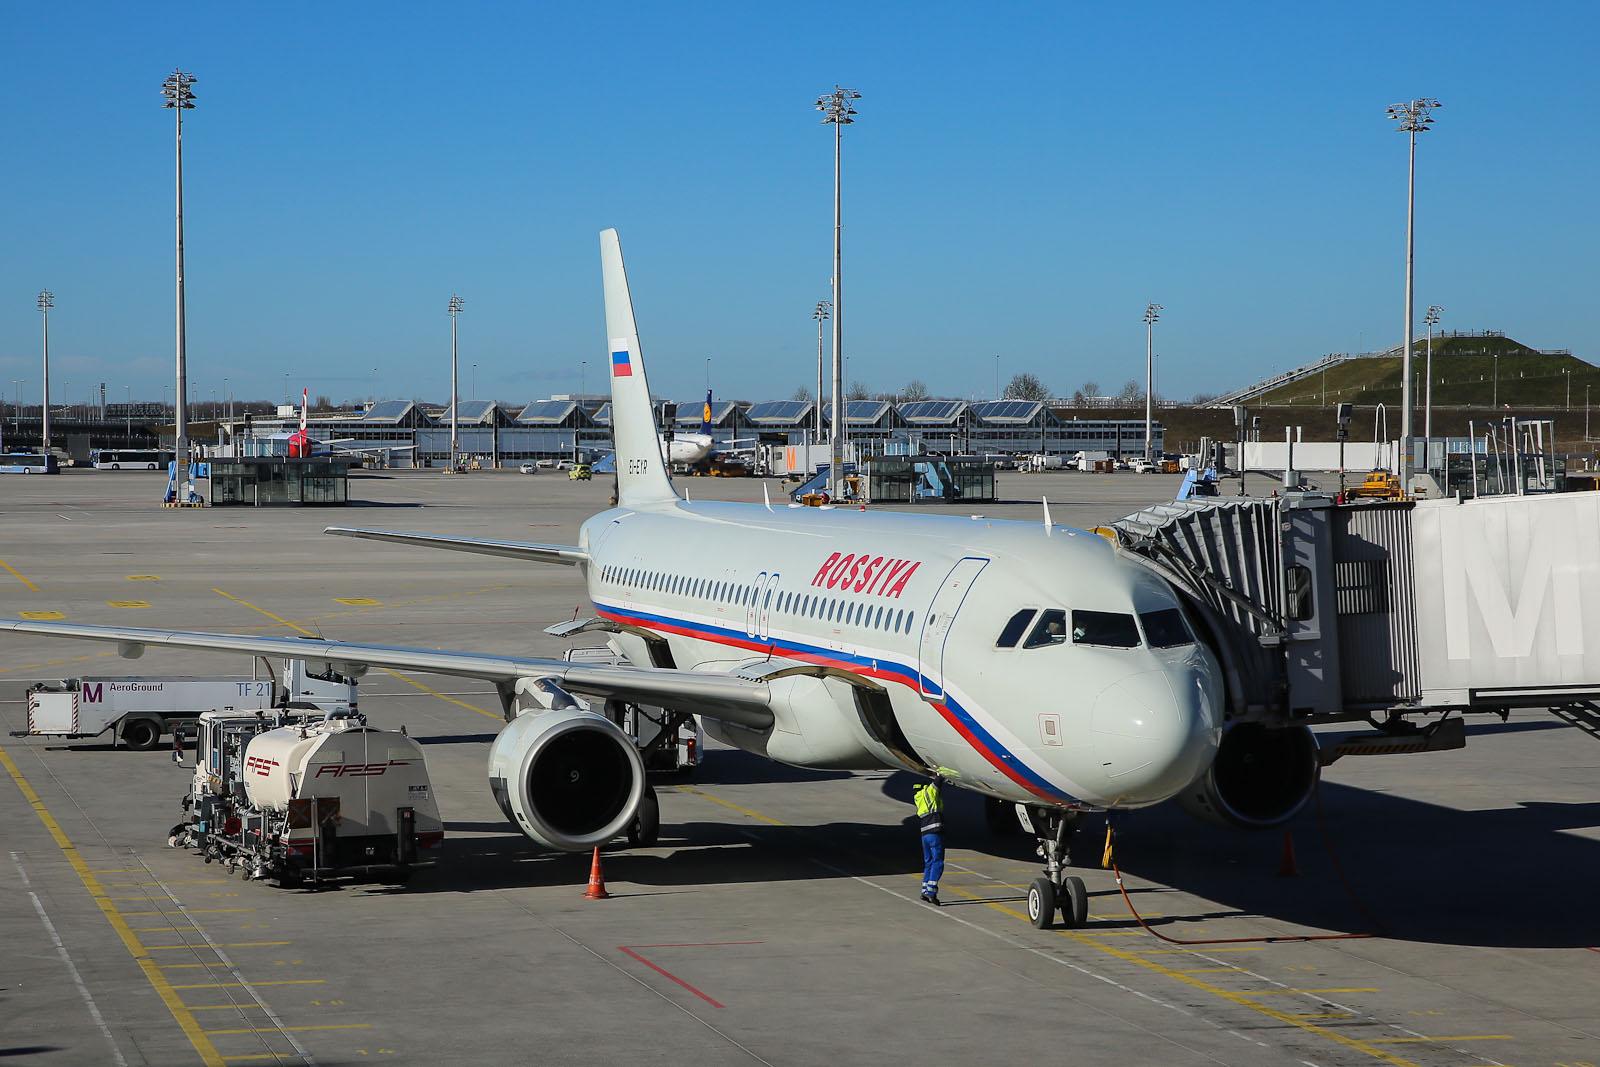 Airbus A320 авиакомпании Россия в аэропорту Мюнхен